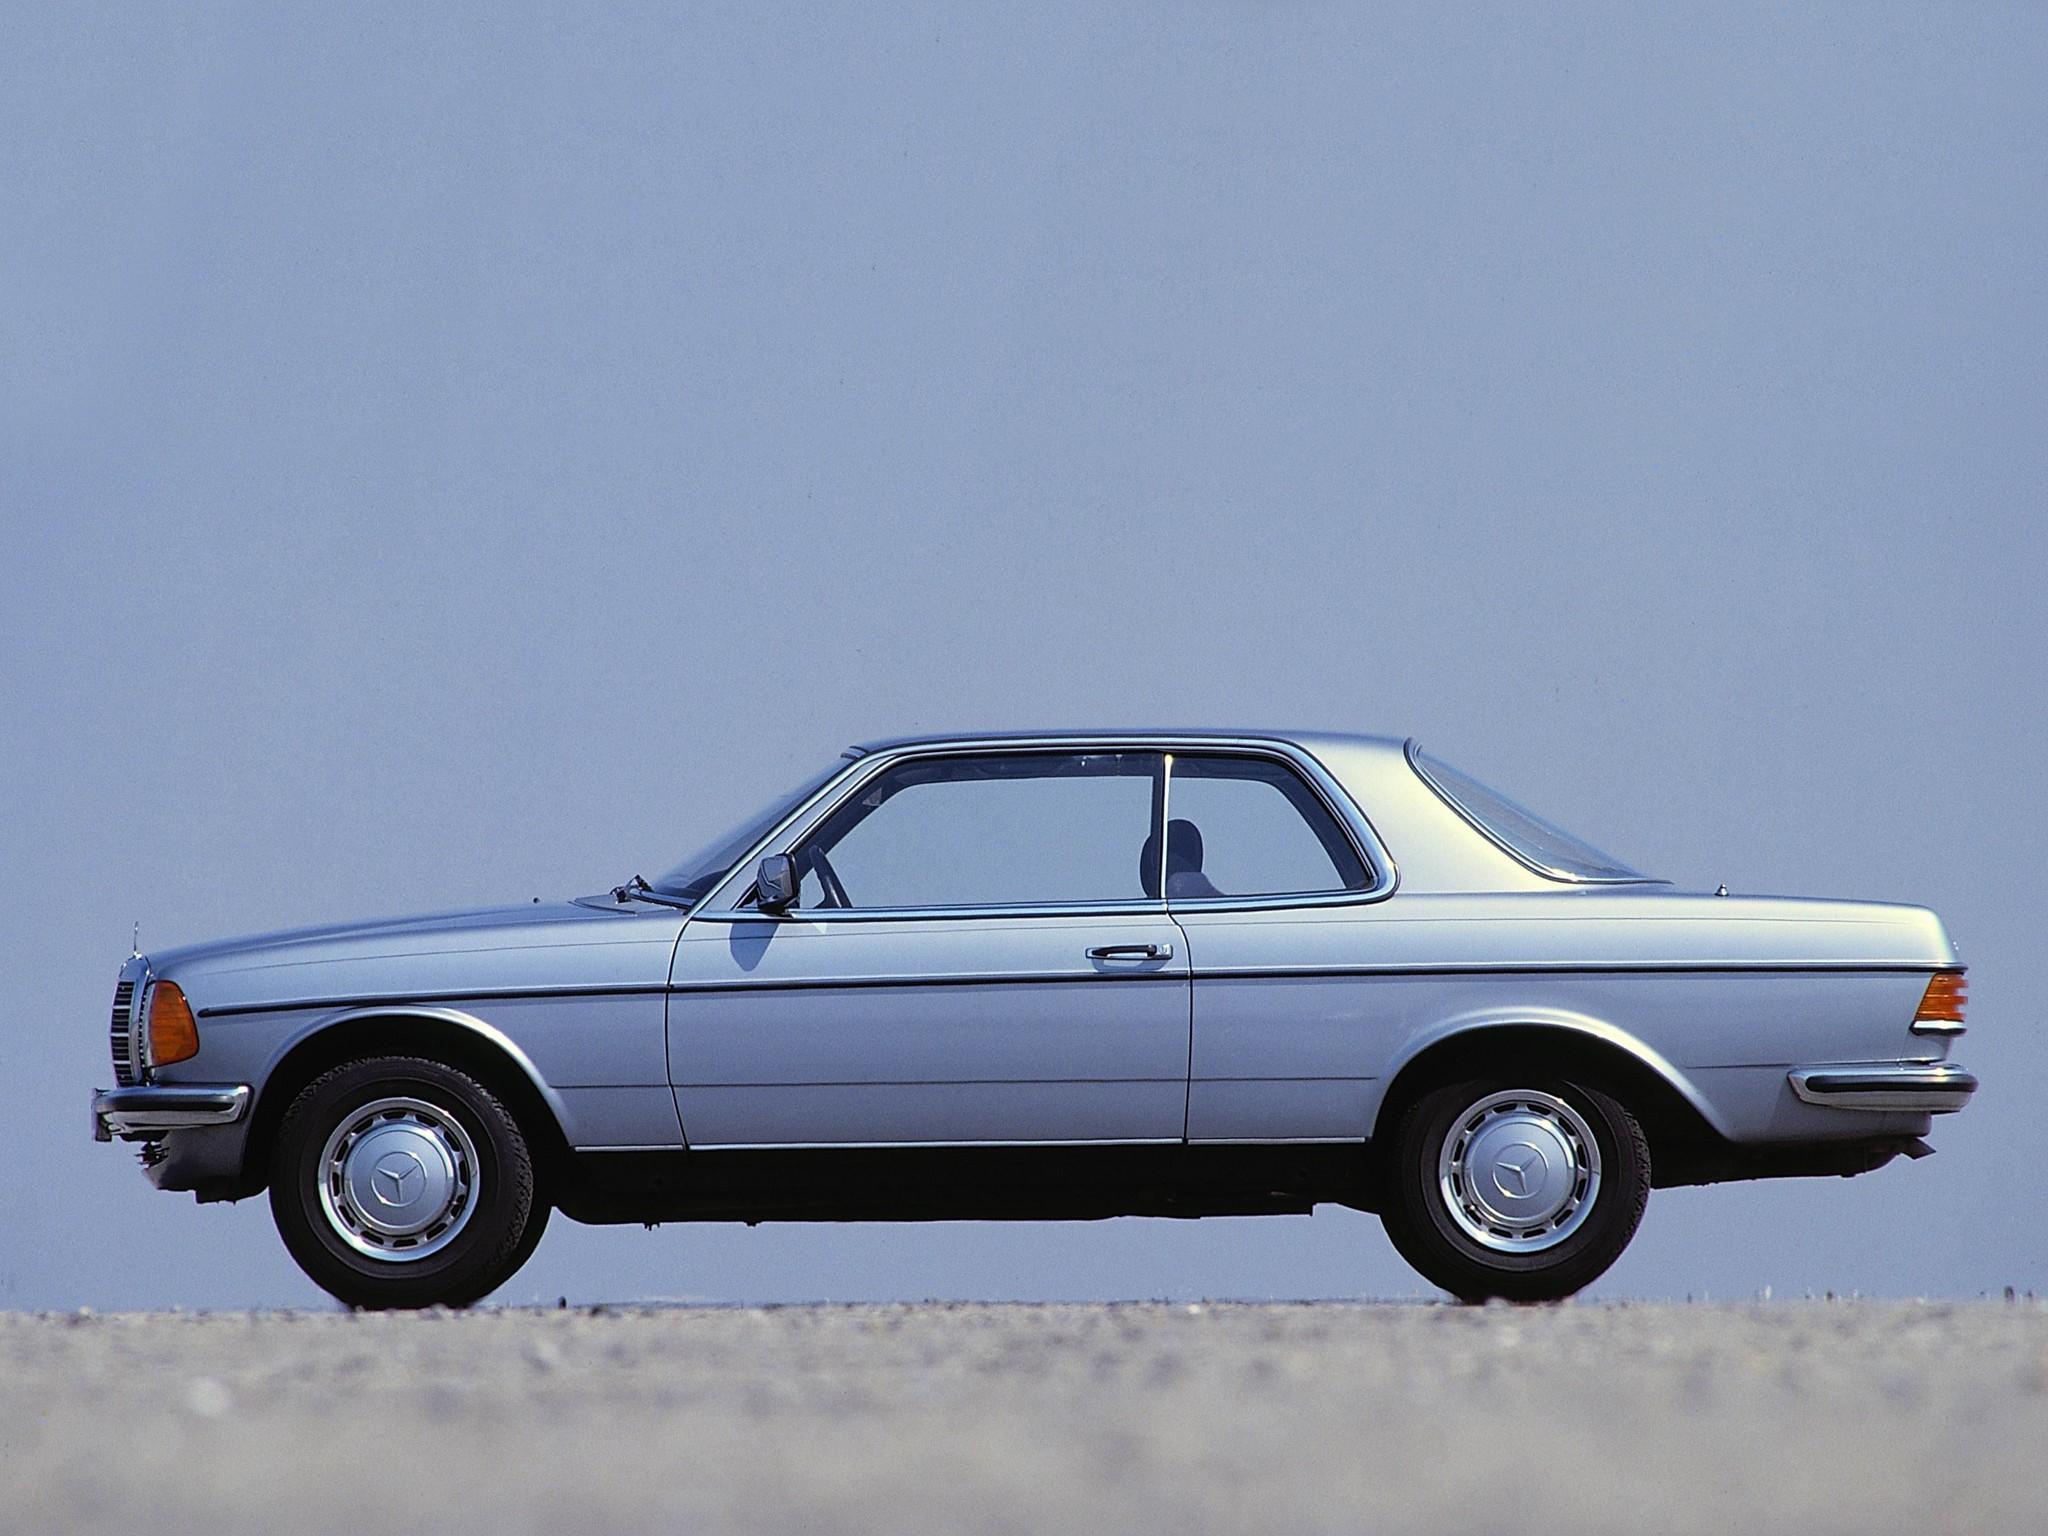 Coupe Vs Sedan >> MERCEDES BENZ Coupe (C123) specs & photos - 1977, 1978, 1979, 1980, 1981, 1982, 1983, 1984, 1985 ...